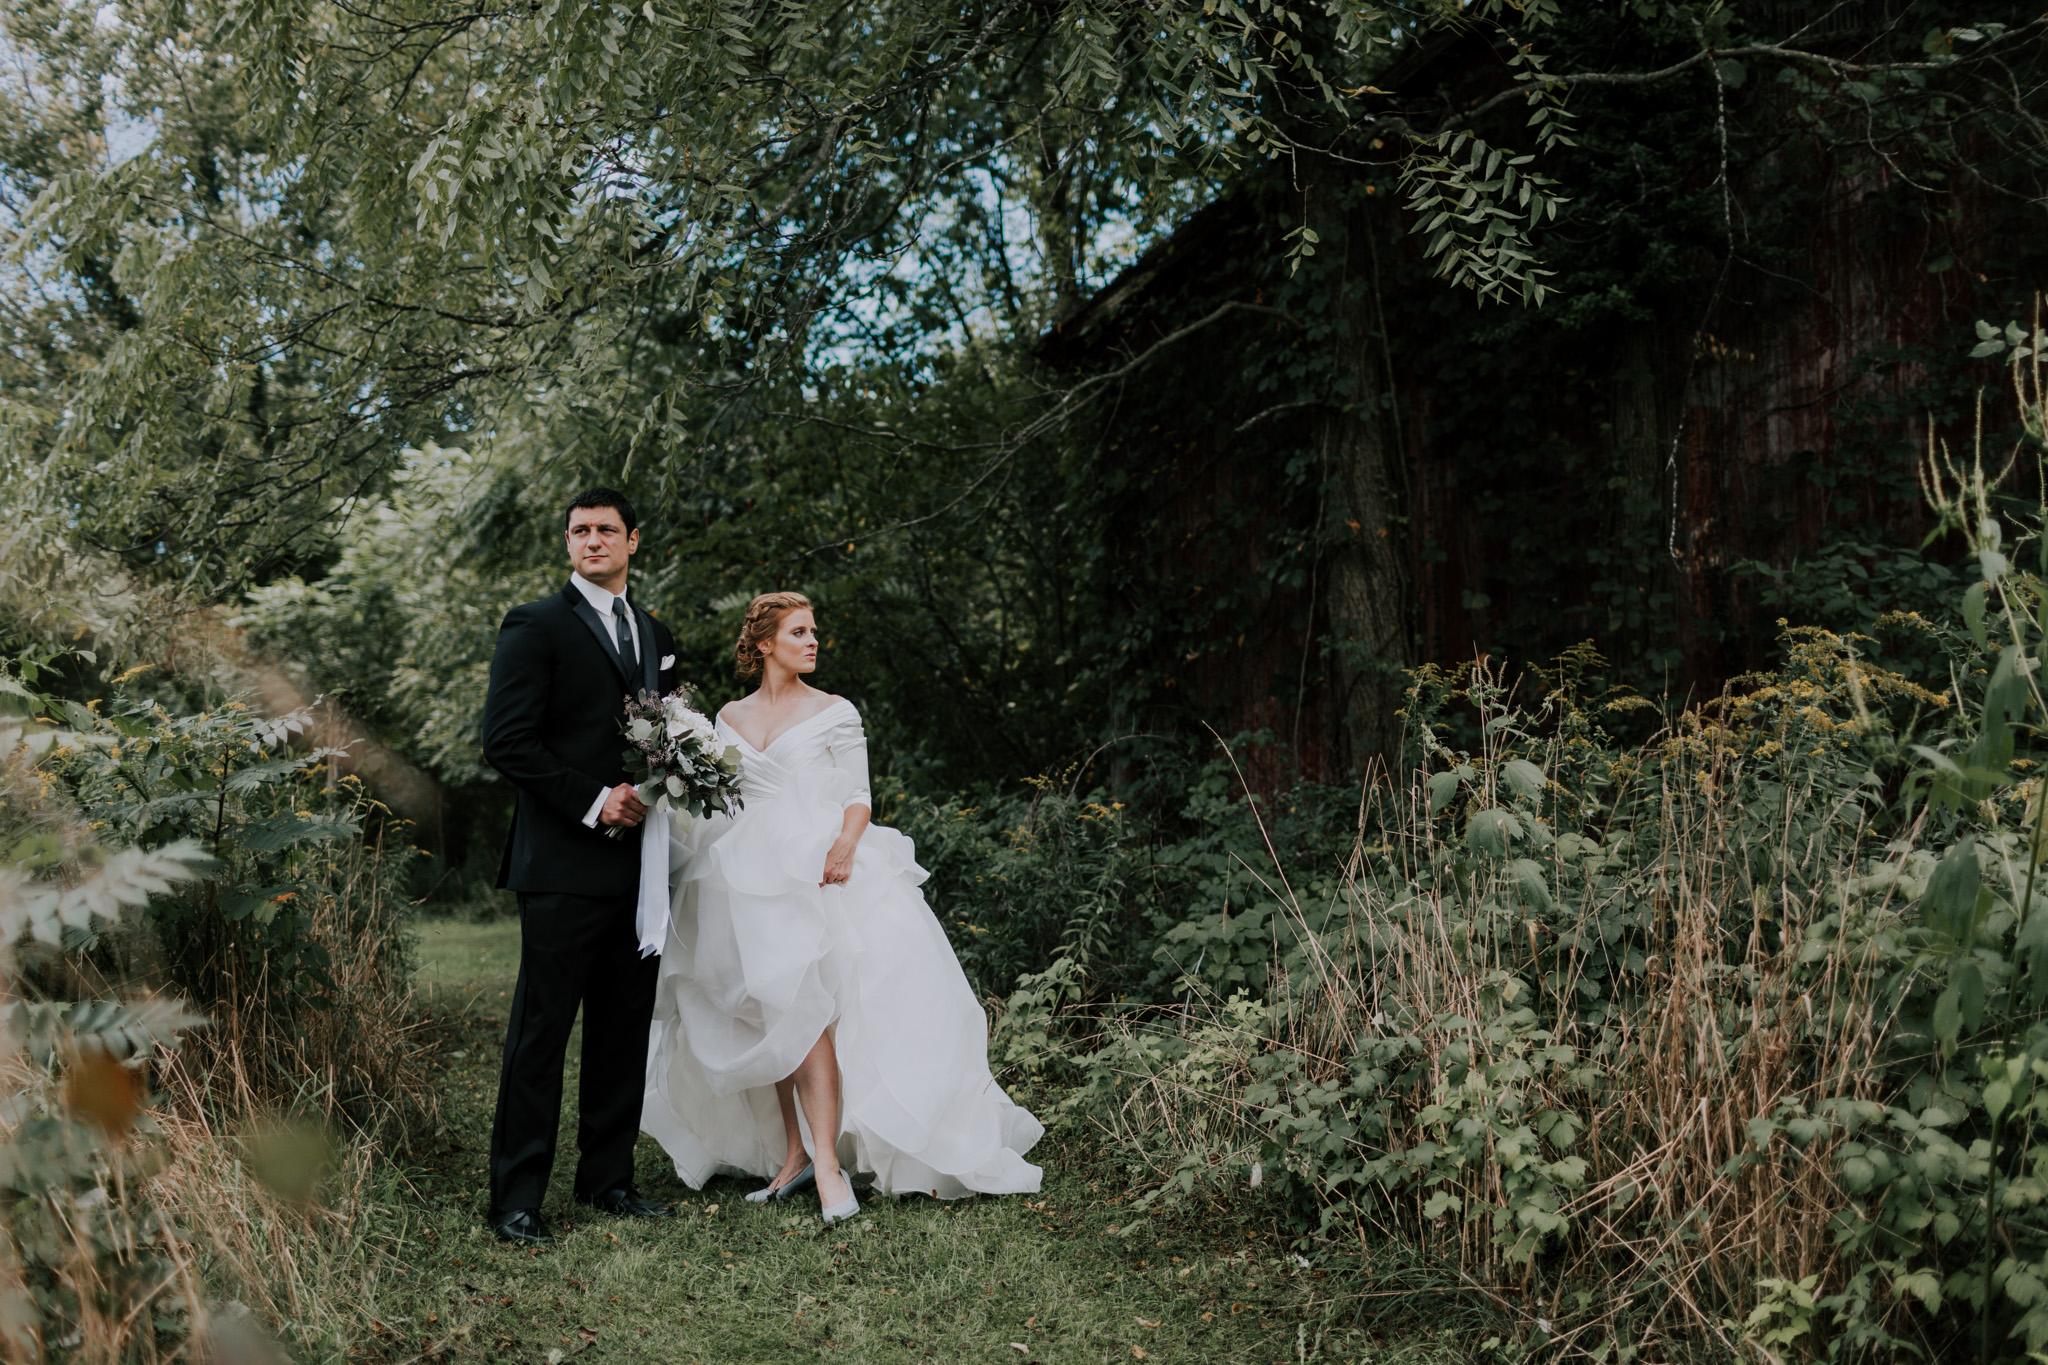 MillCreek-Wilde-Wedding-Barn-Michigan-Eliza-Eric-Vafa-Photo392.jpg